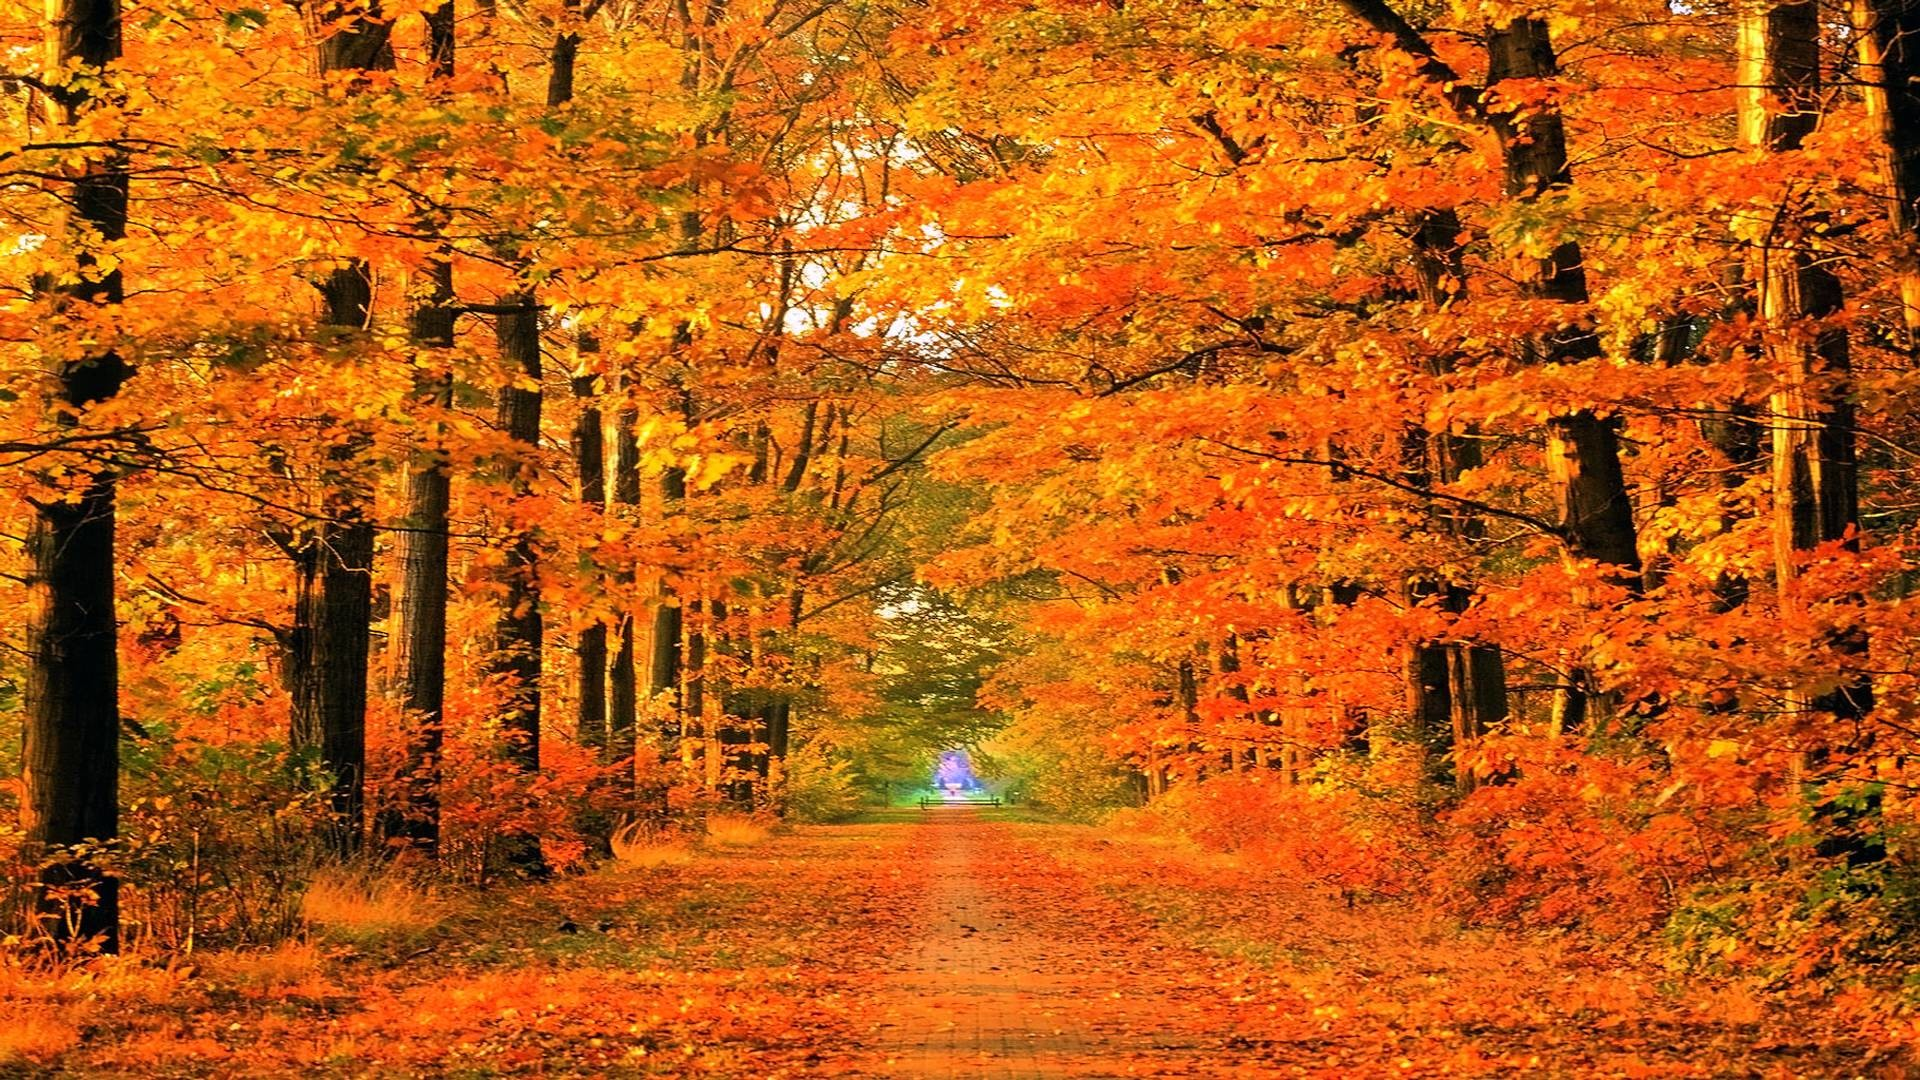 Nature & Landscape Autumn Fall Season wallpapers (Desktop, Phone ...